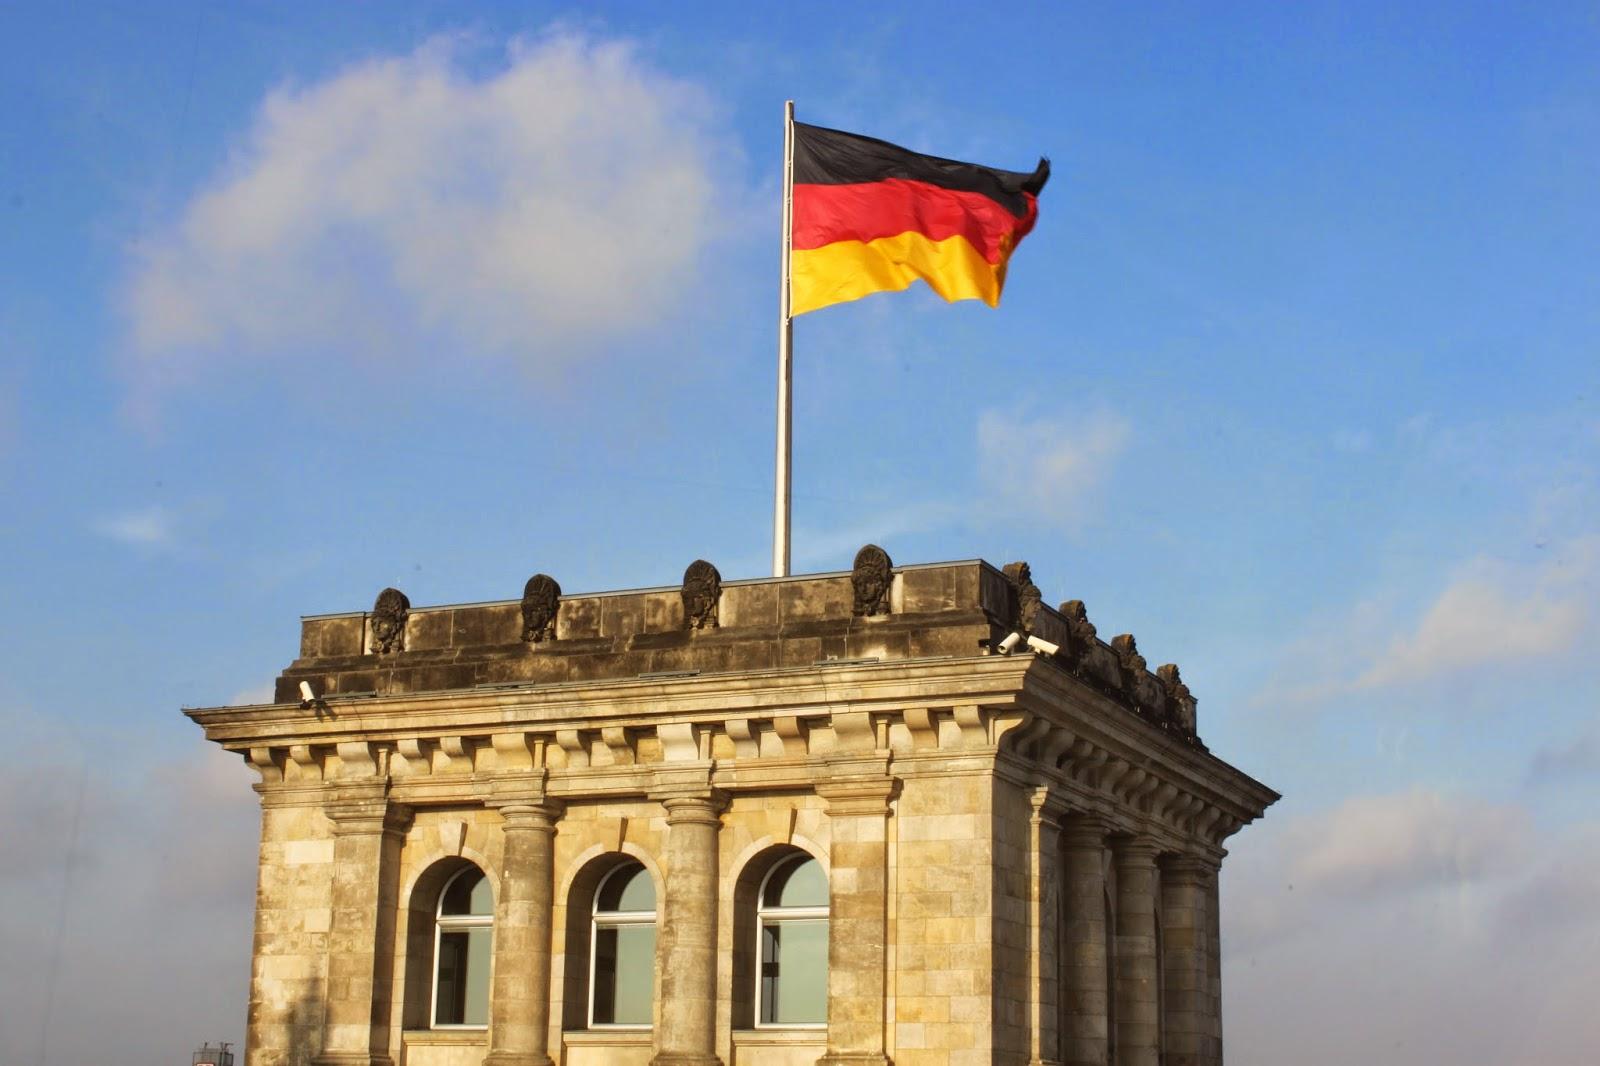 Berlin – 4 months in